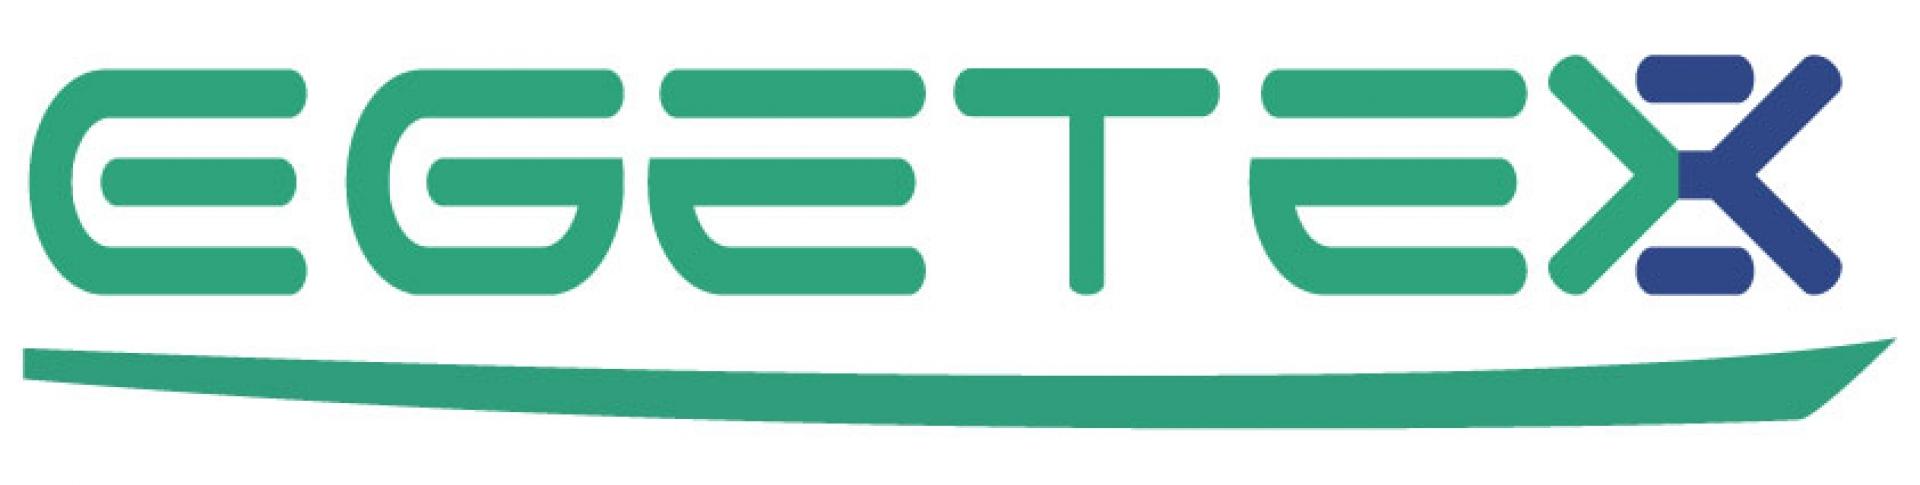 Egetex